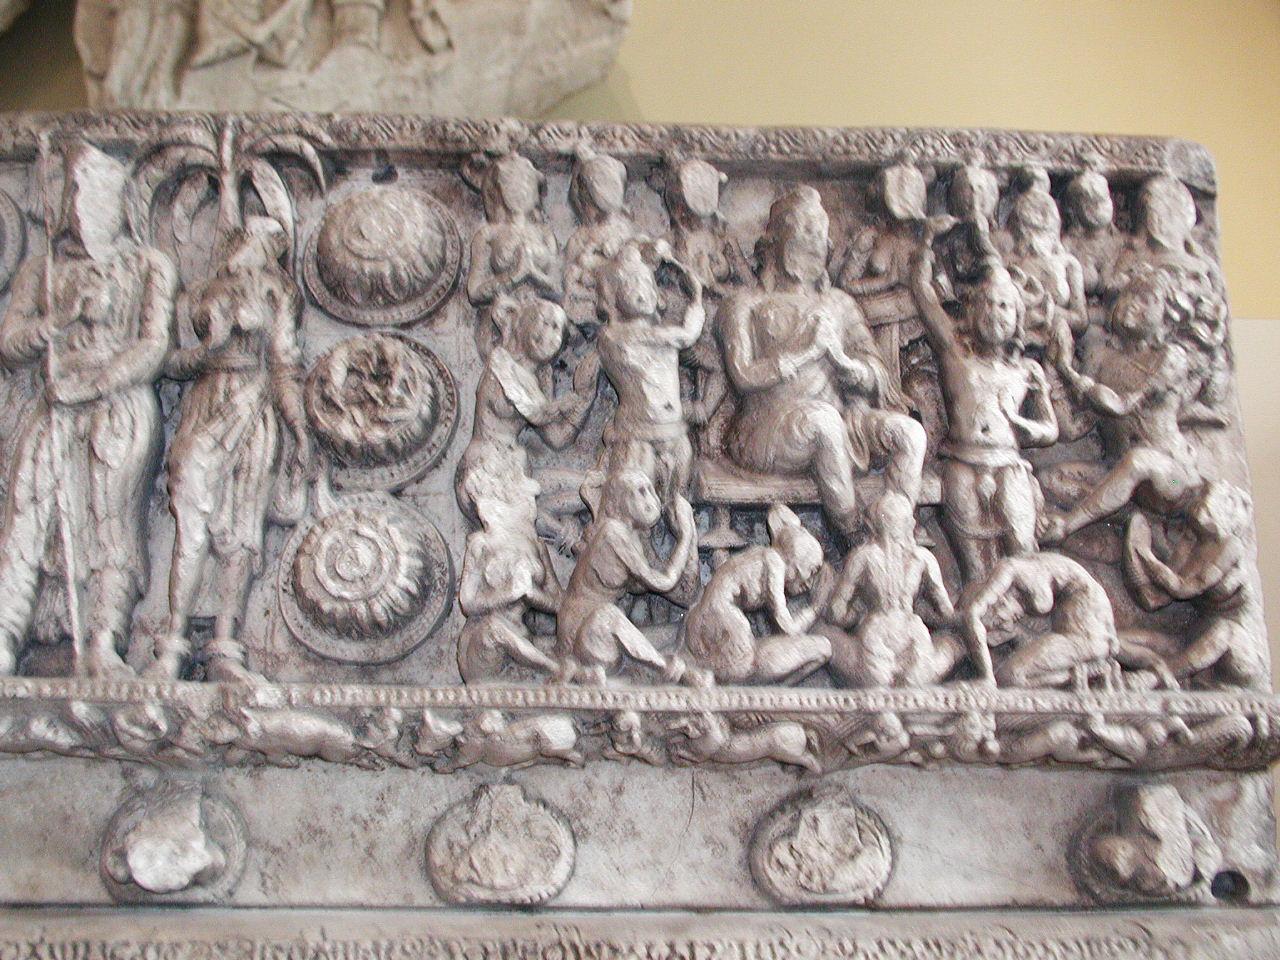 39 Best Amaravati images | East asian countries, Buddhism ...